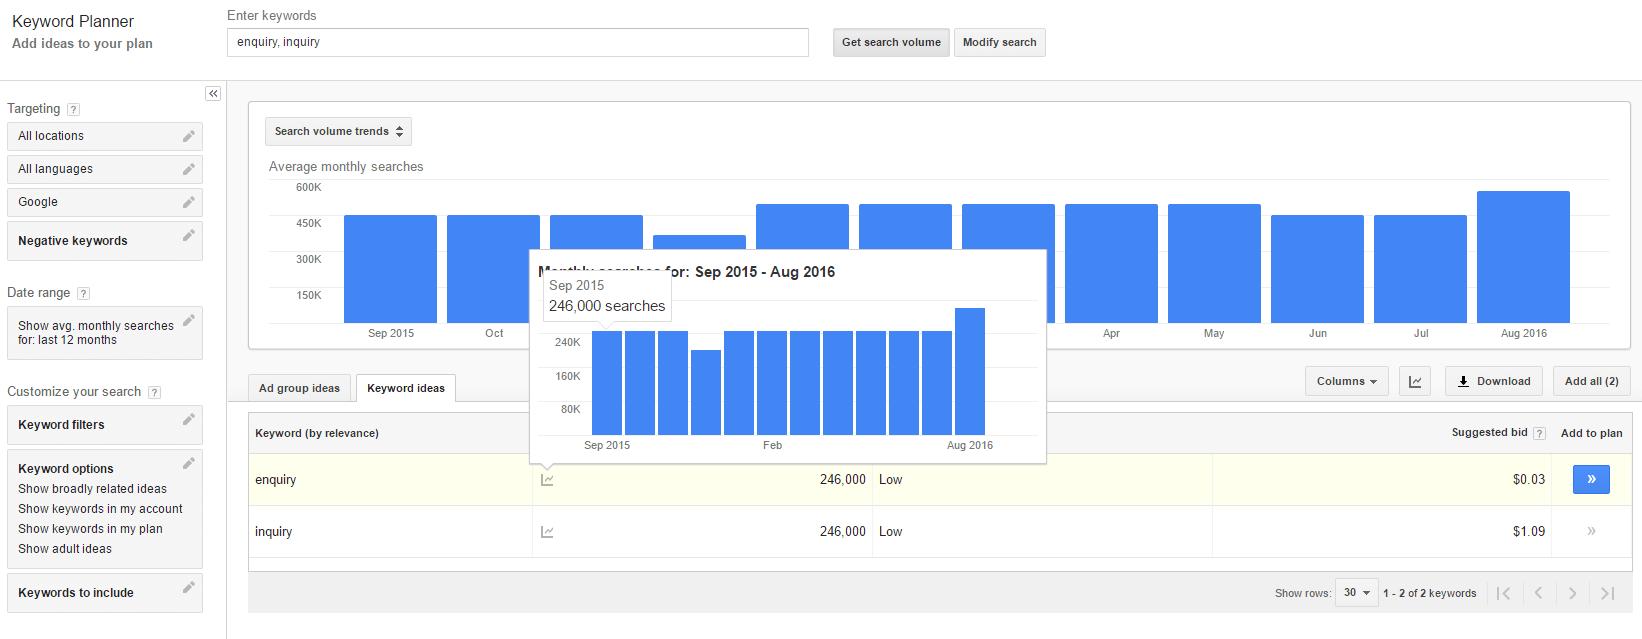 enquiry average volumes screenshot